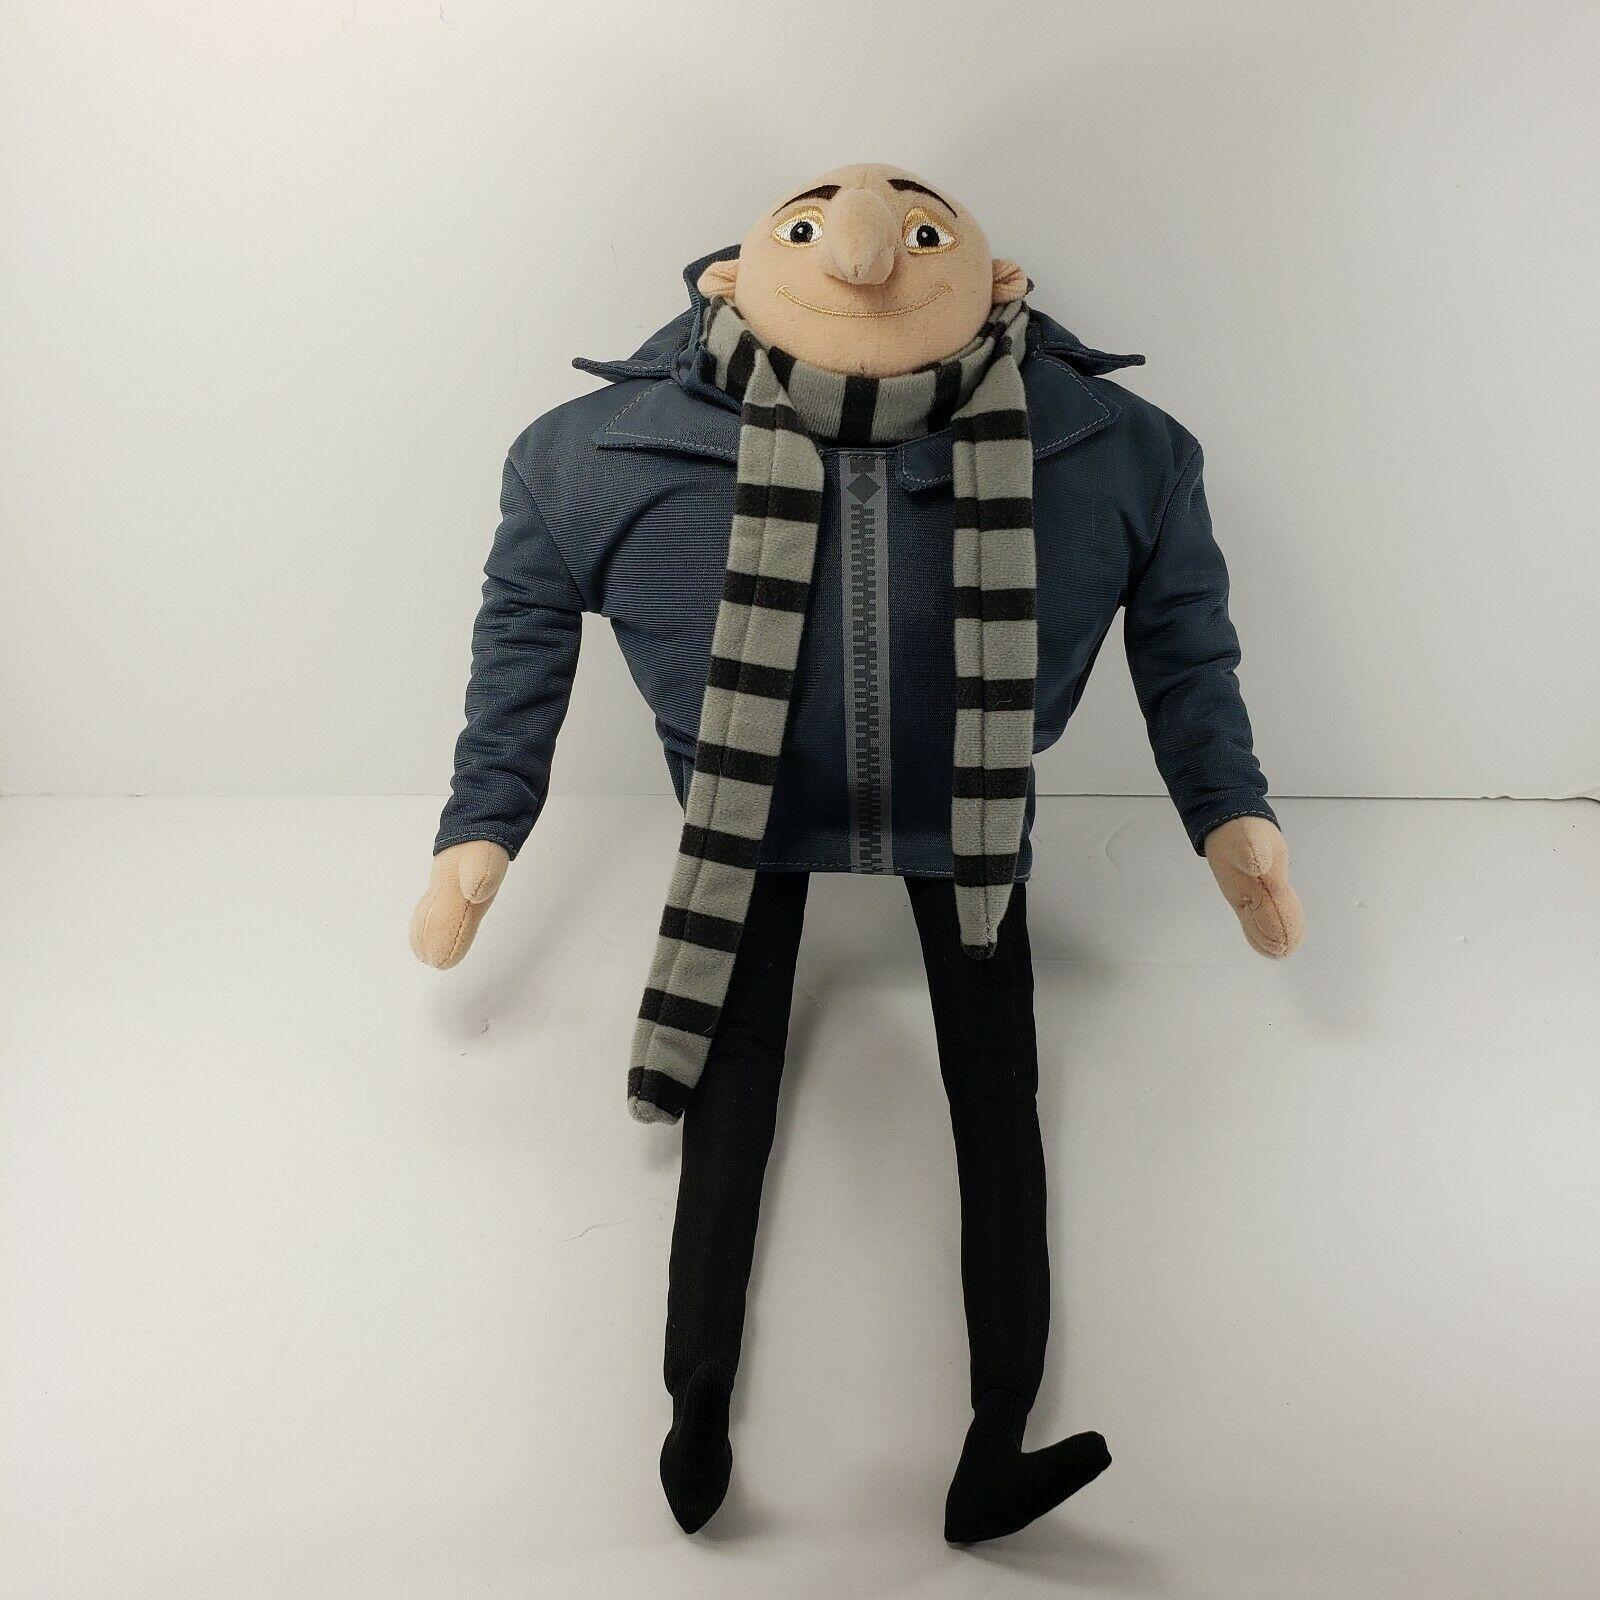 "Gru Despicable Me Minion Mayhem Universal Studios 16"" Plush Doll Stuffed Toy - $24.18"